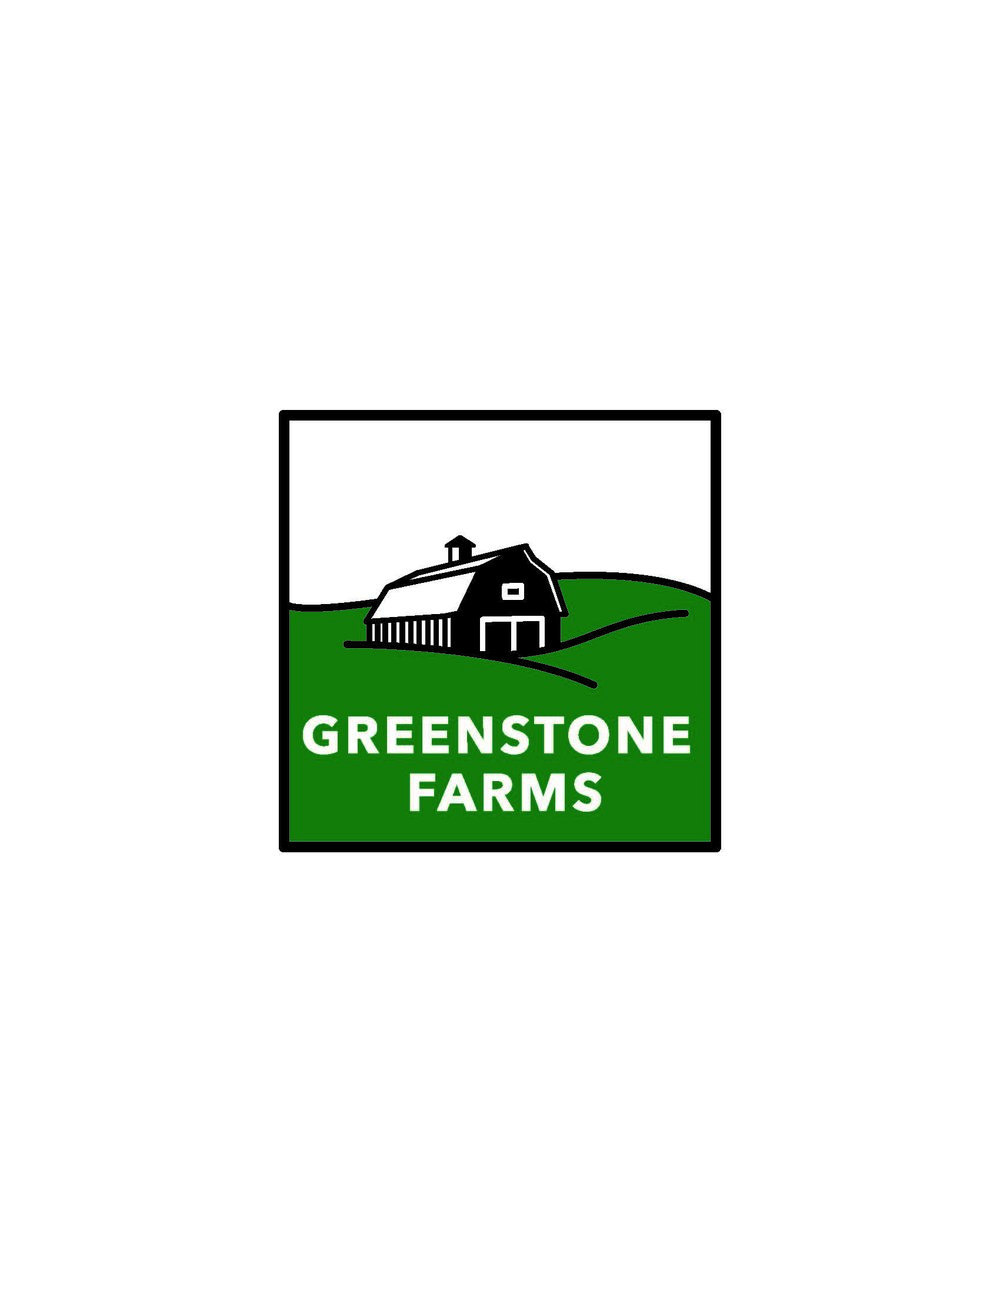 greenstone_logo.10.21.16_Page_1.jpg